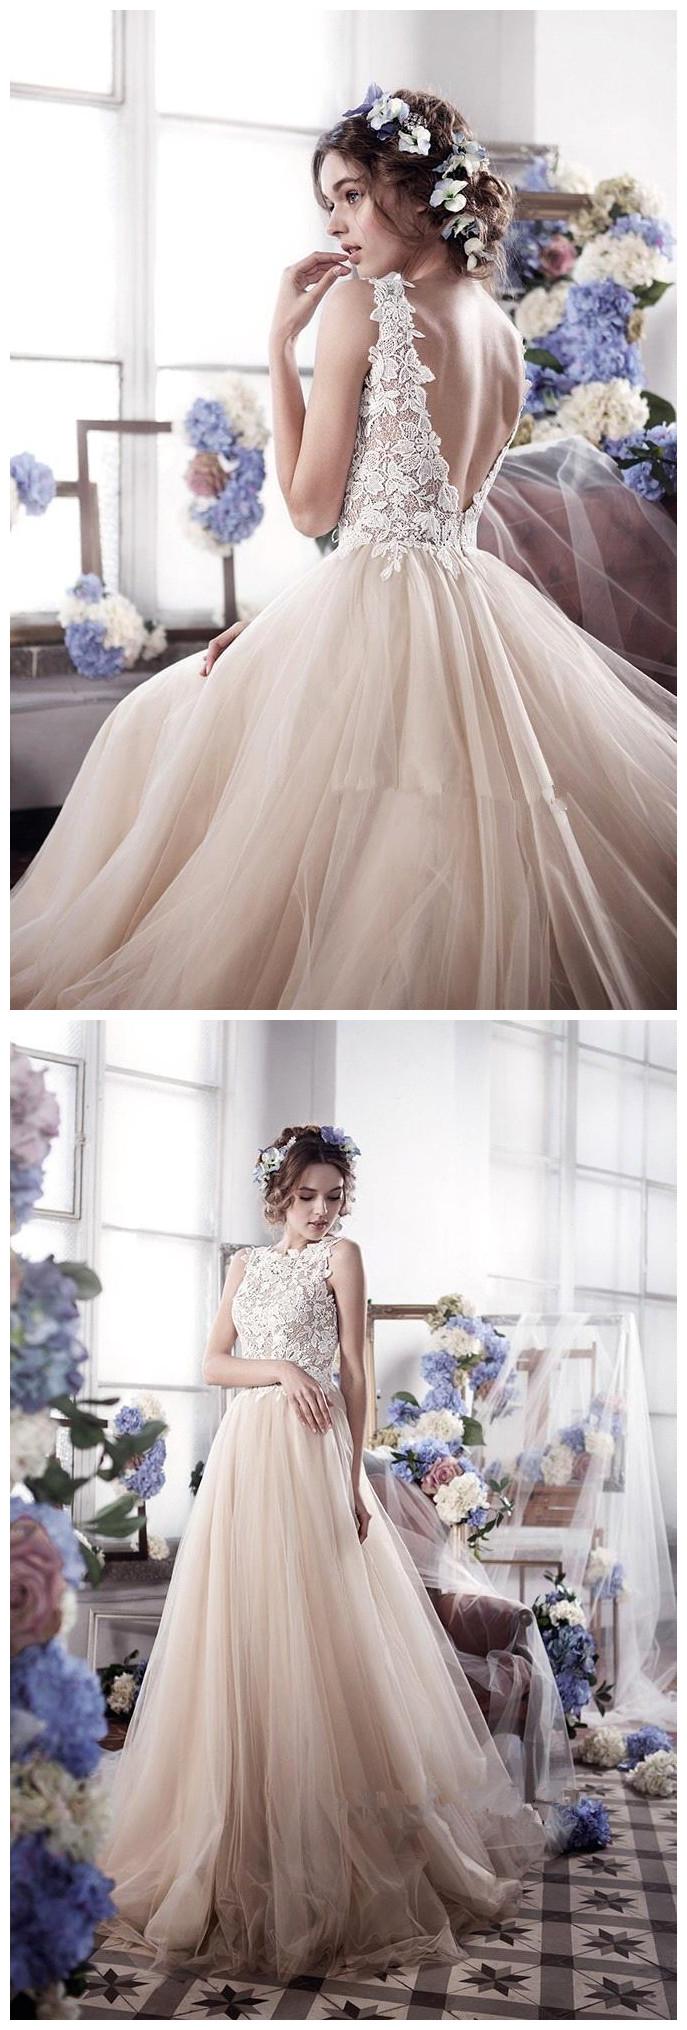 Sleeveless_Romantic_Tulle_bridal_dresses_wedding_gowns_Vintage_Appliques_Wedding_Dress